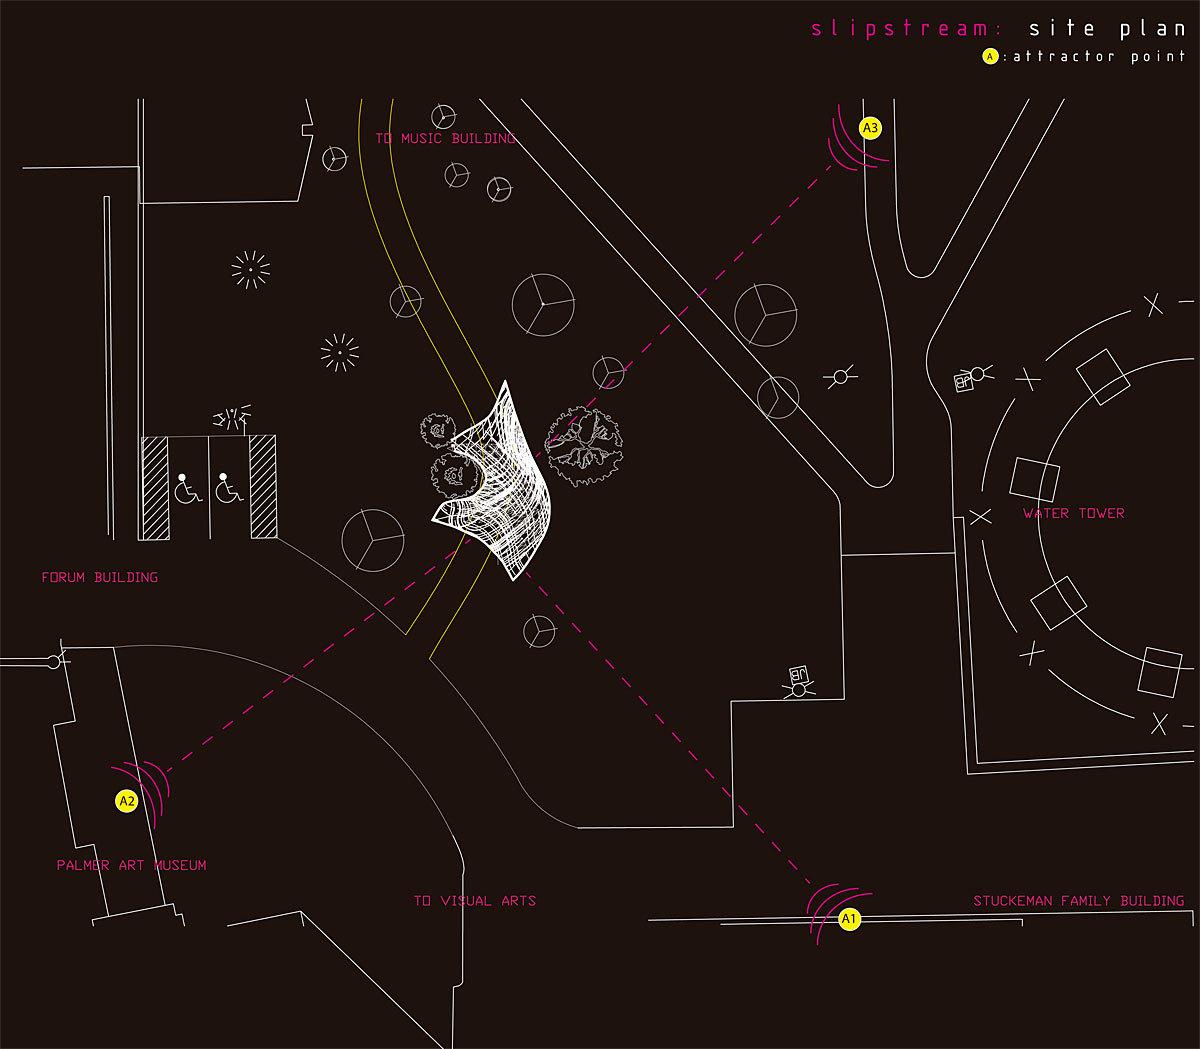 Slipstream: Site Plan